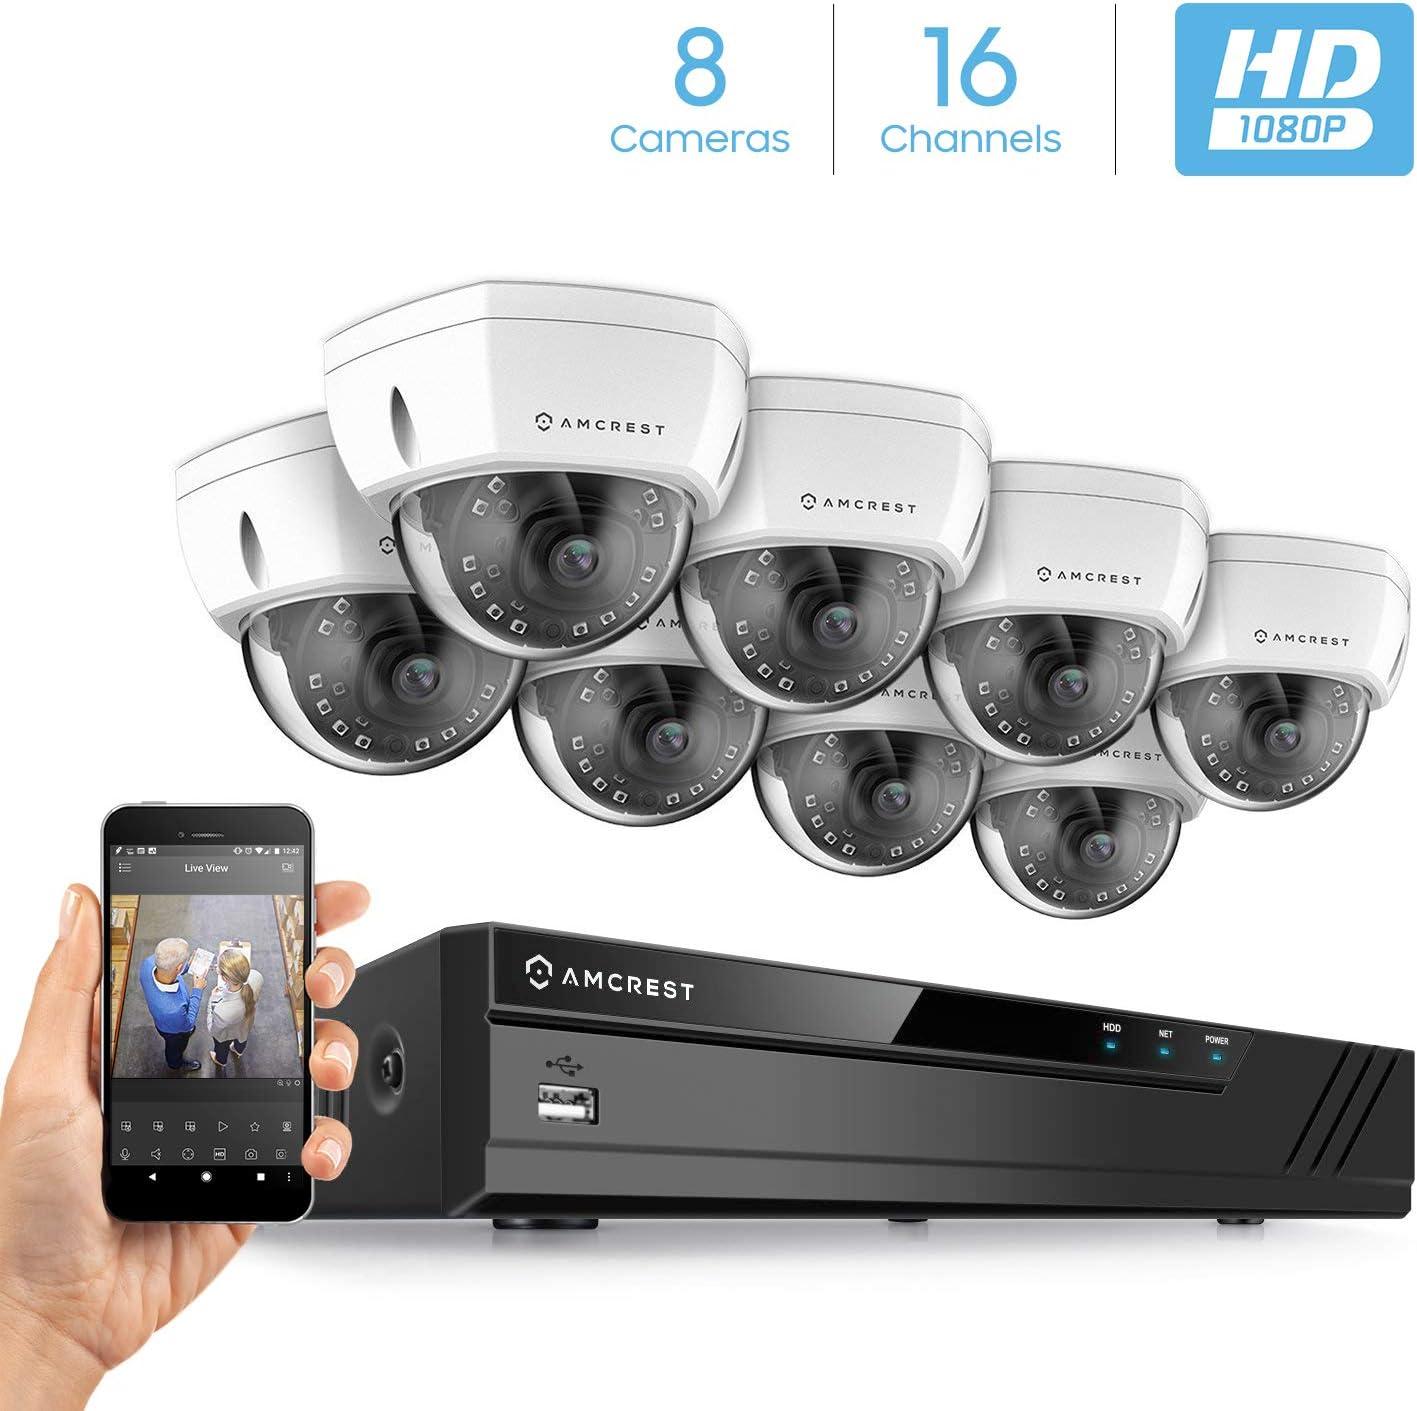 Amcrest 2MP 1080P Security Camera System, w 4K 16CH 8-Port PoE NVR 8 x 2-Megapixel 3.6mm Wide Angle Lens Weatherproof Metal Dome PoE IP Cameras, NV4116E-HS-IP2M-851EW8 White